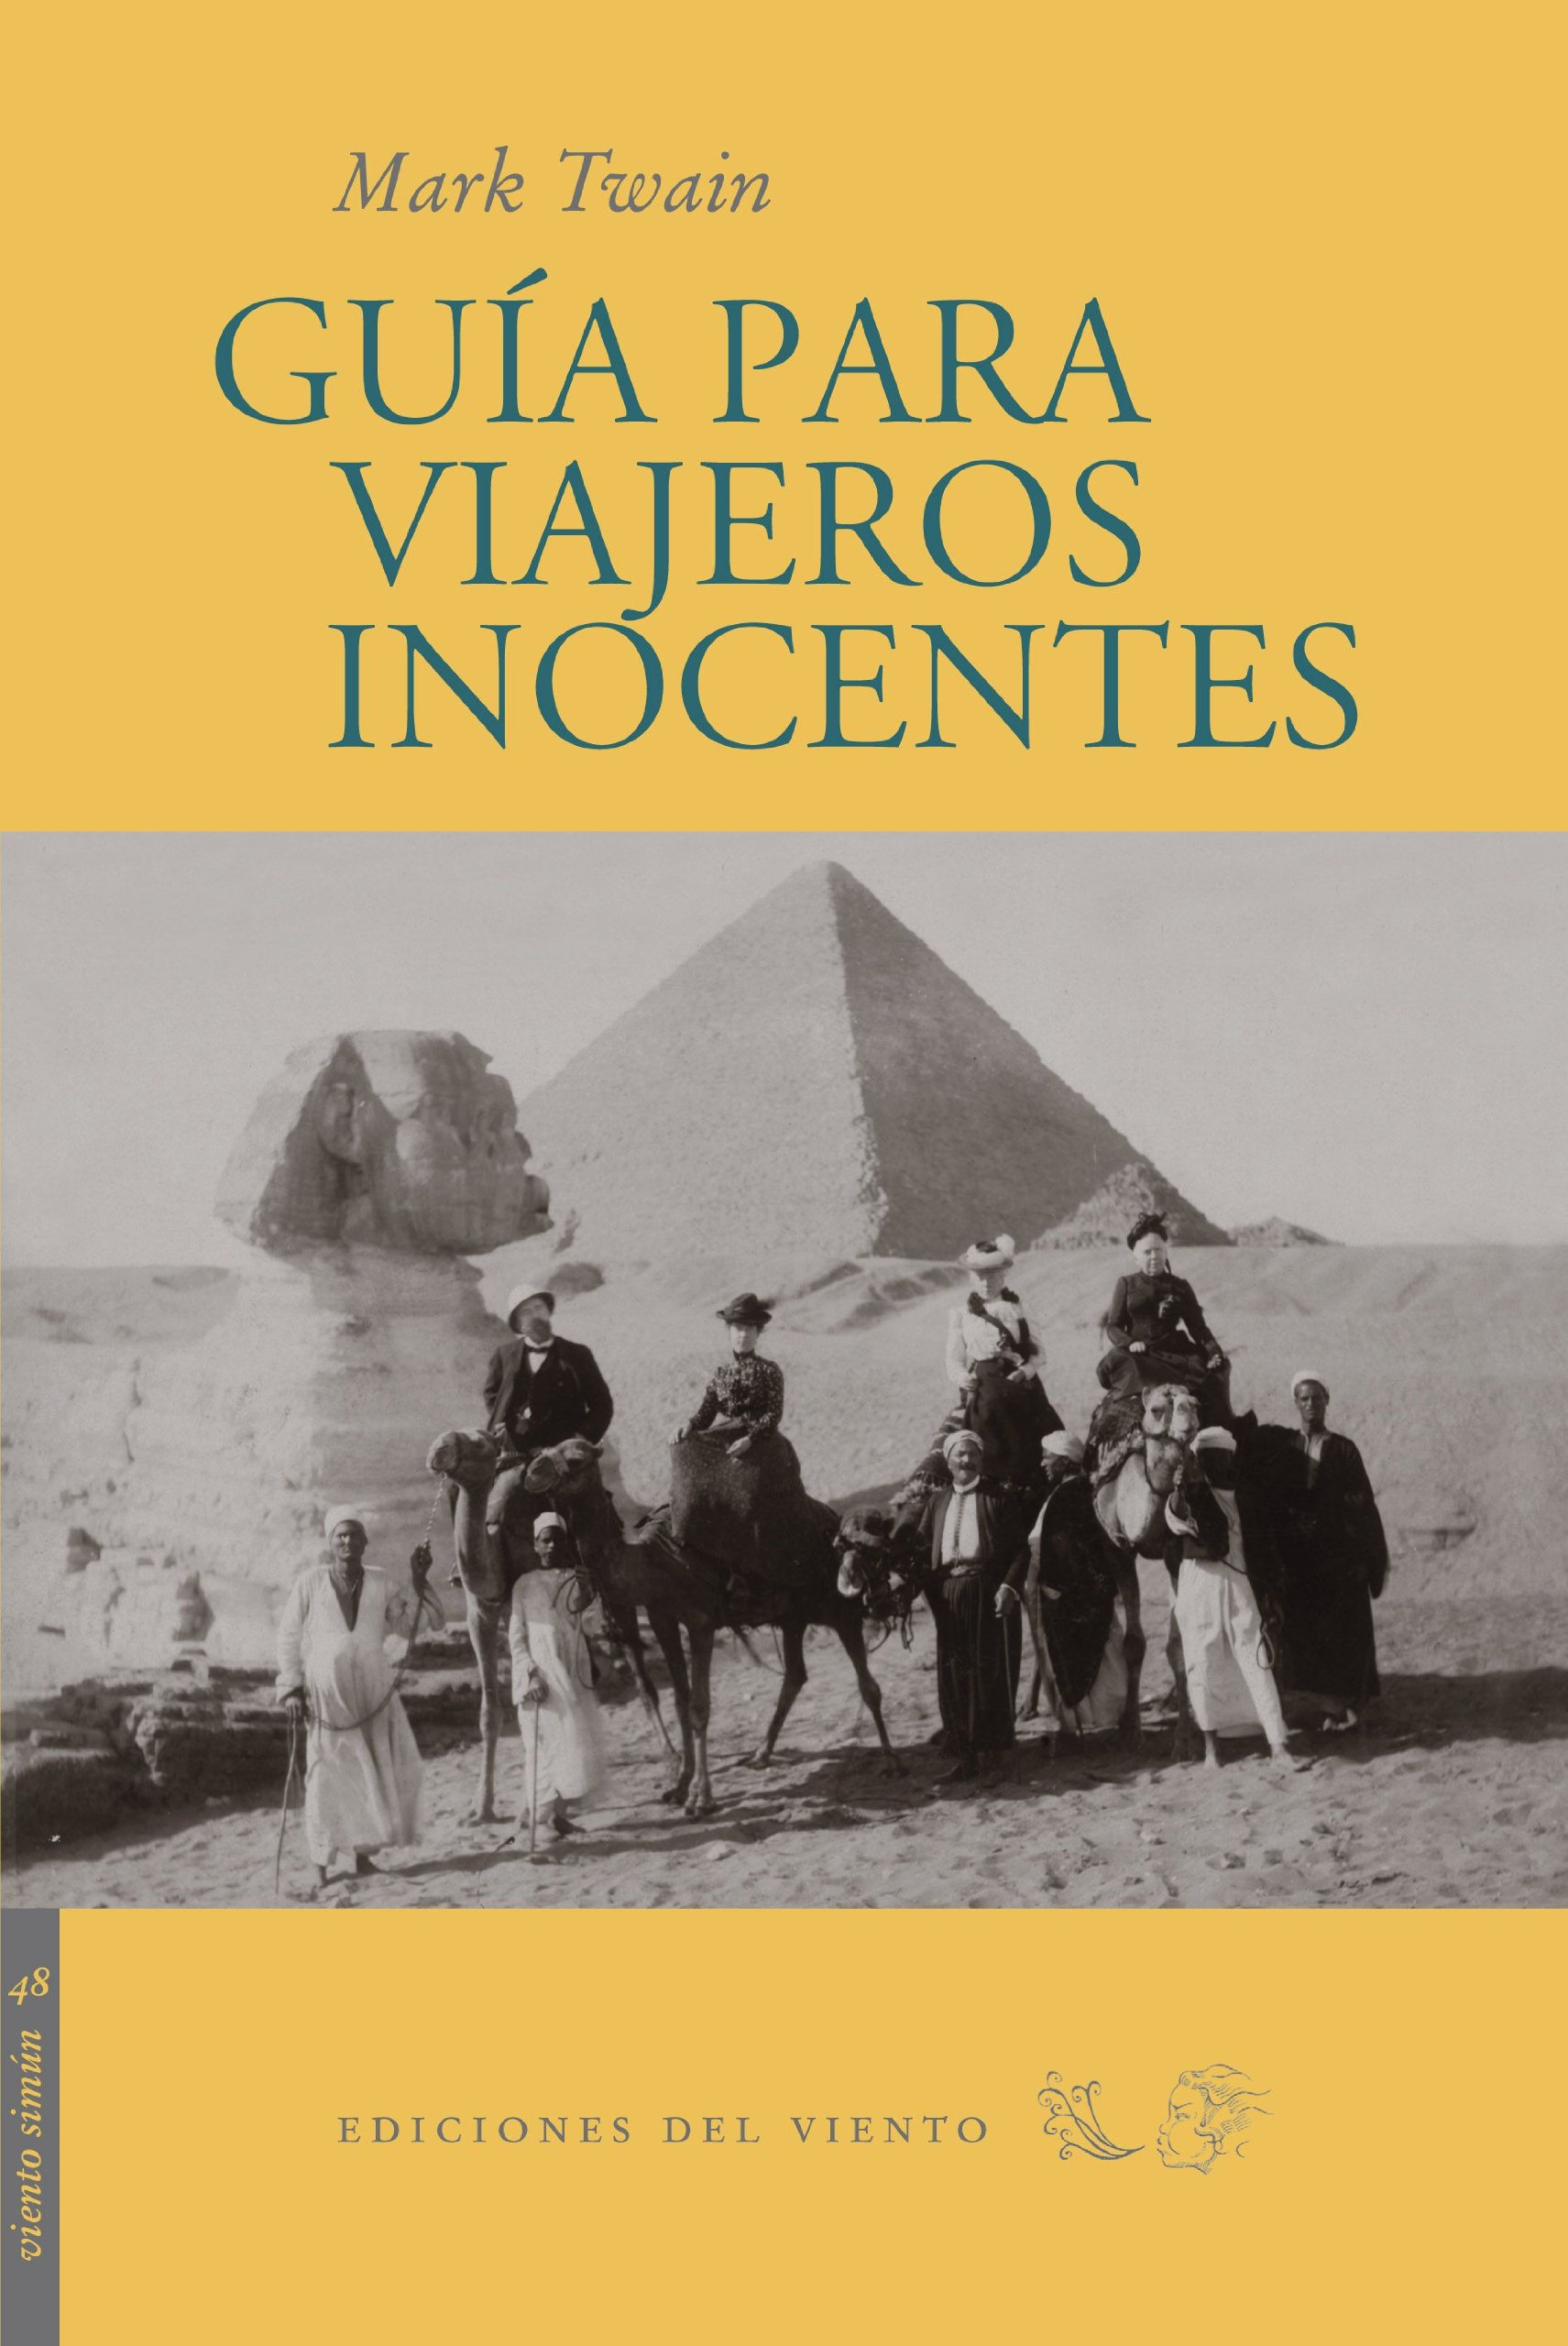 Download Guia para viajeros inocentes pdf